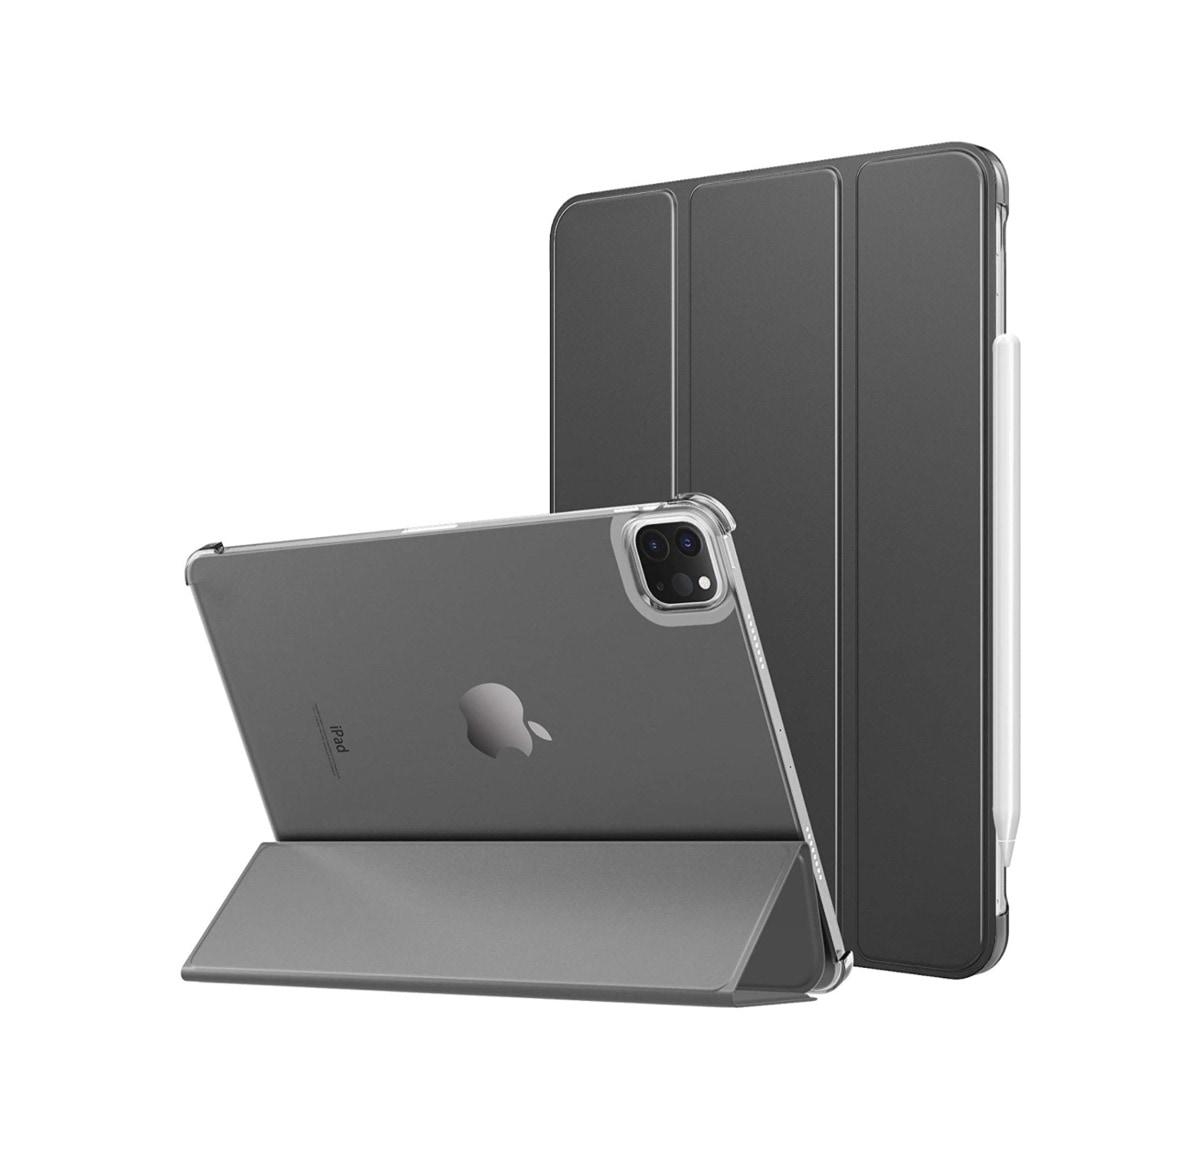 MoKo iPad Pro 11 2021 hardshell tri-fold stand case